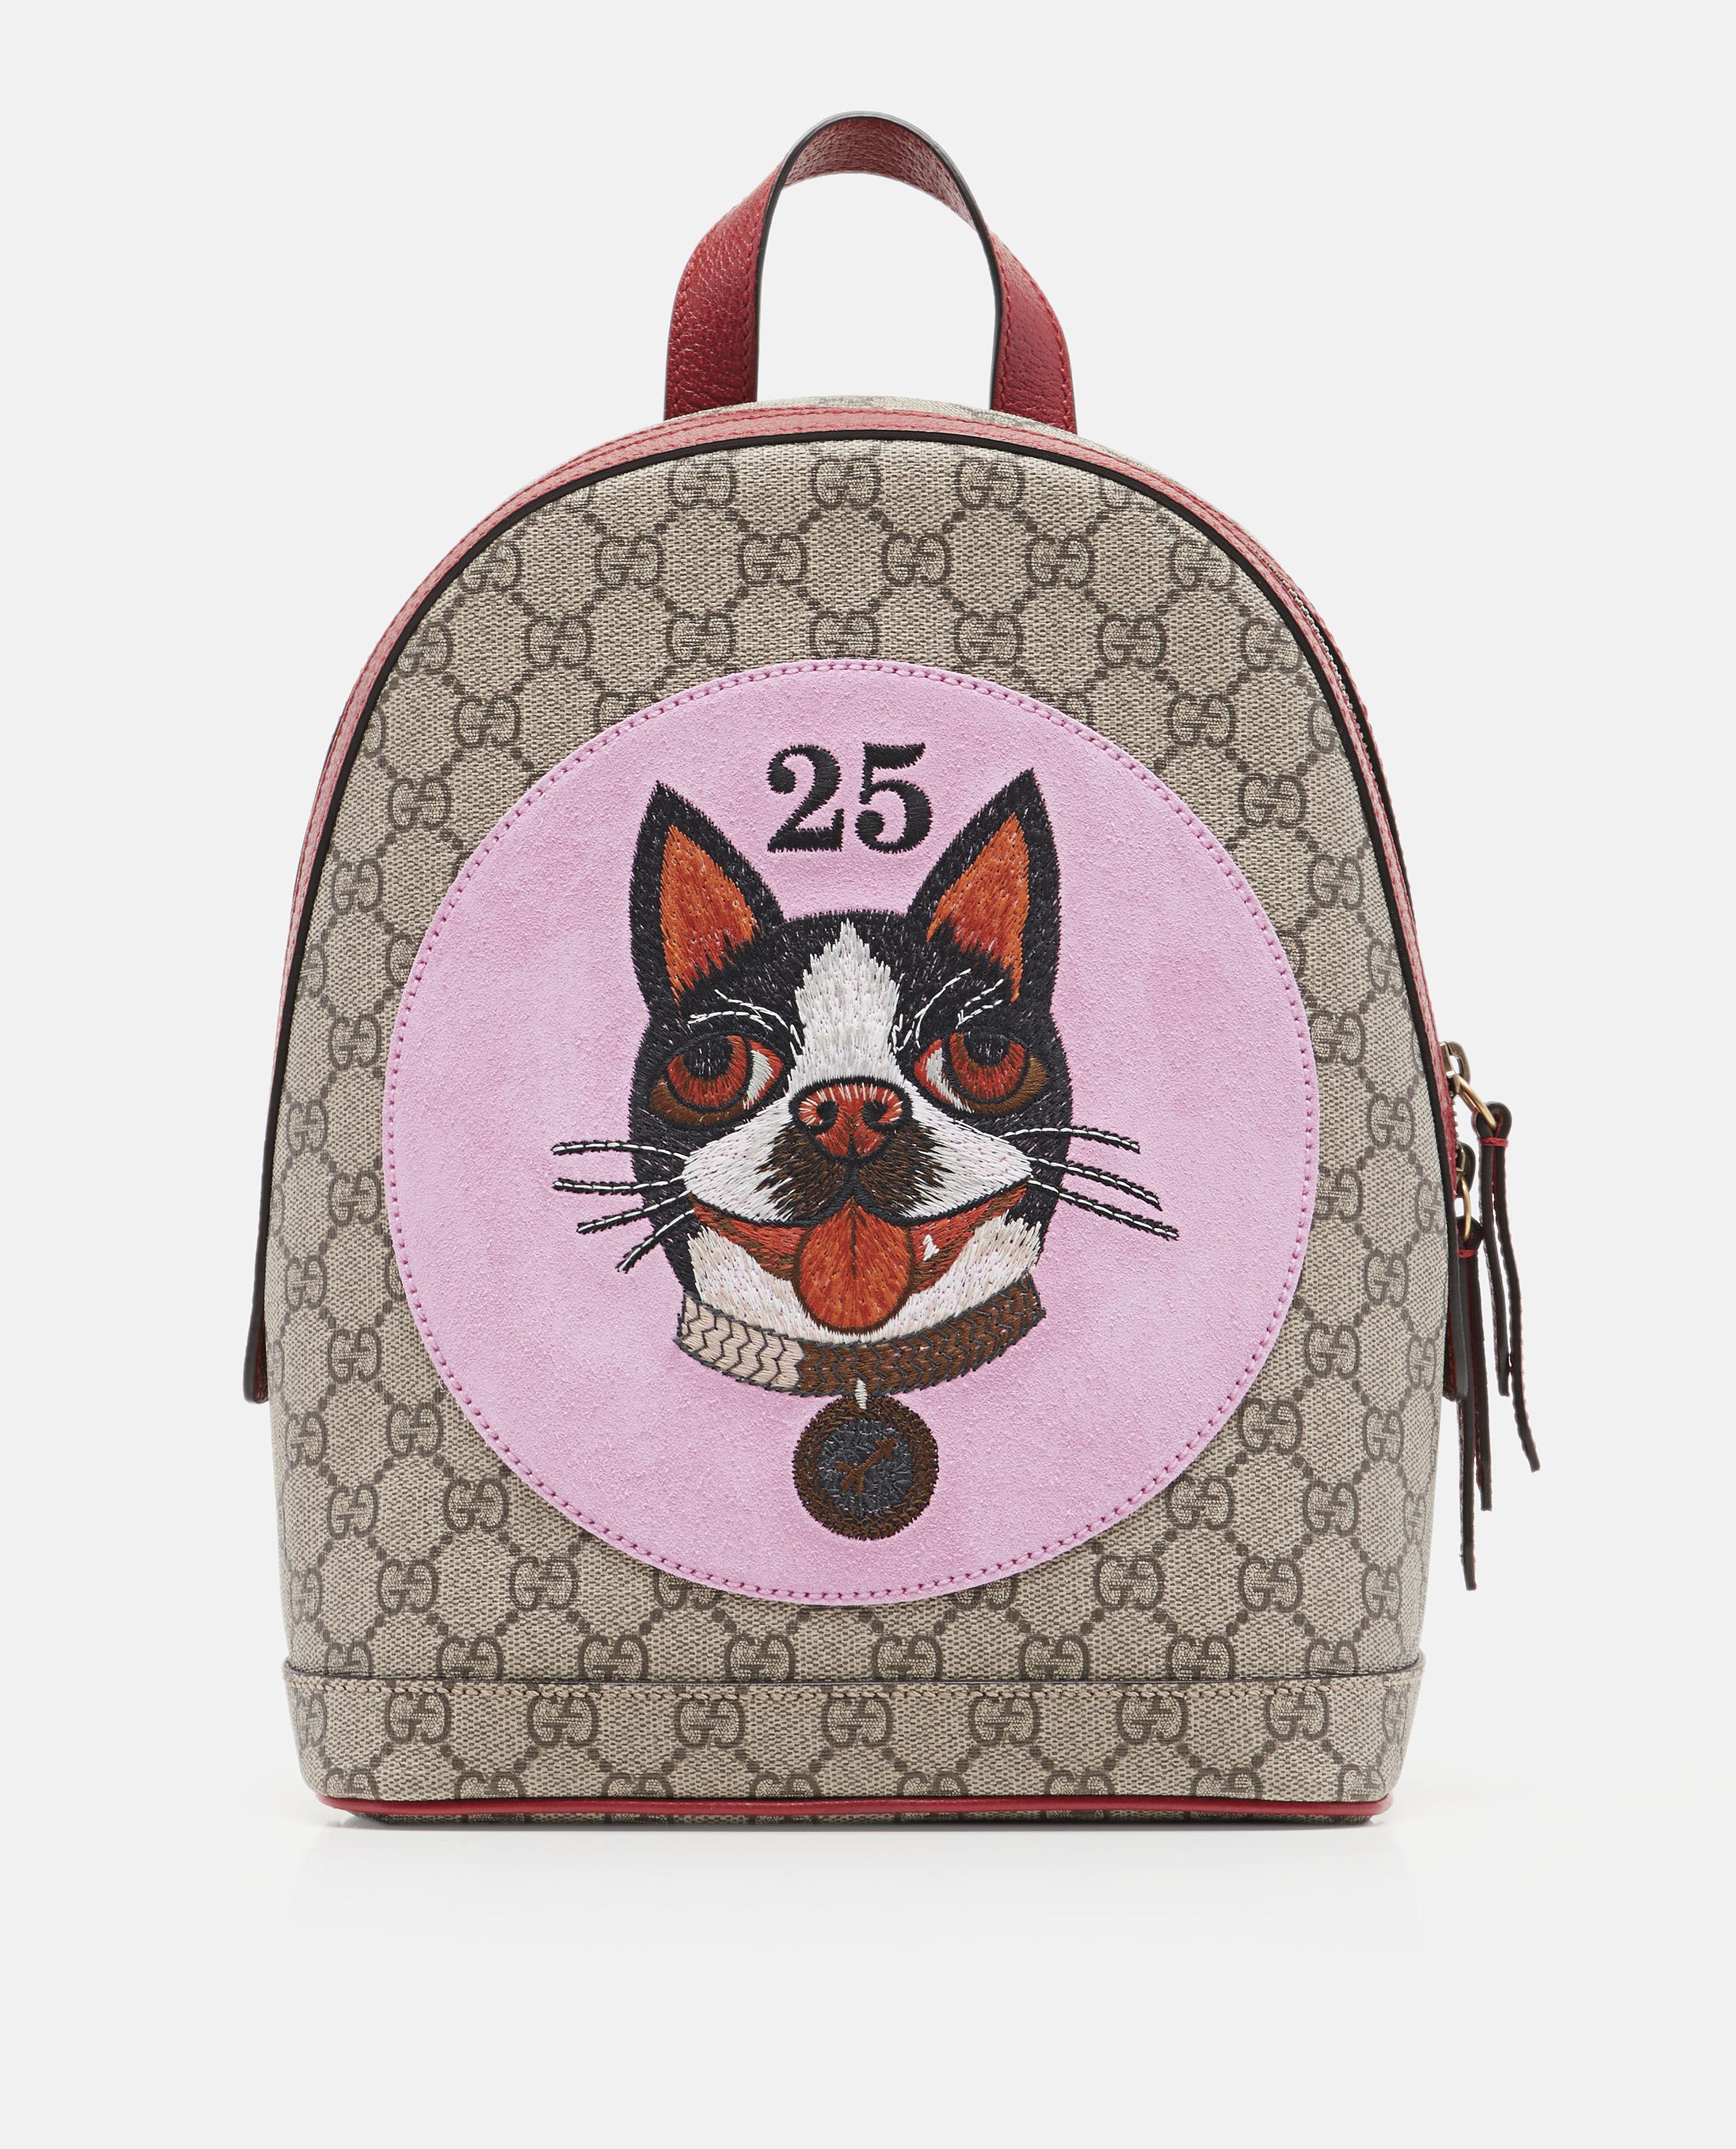 4abe07dd0e2b Lyst - Gucci GG Supreme Bosco Backpack for Men